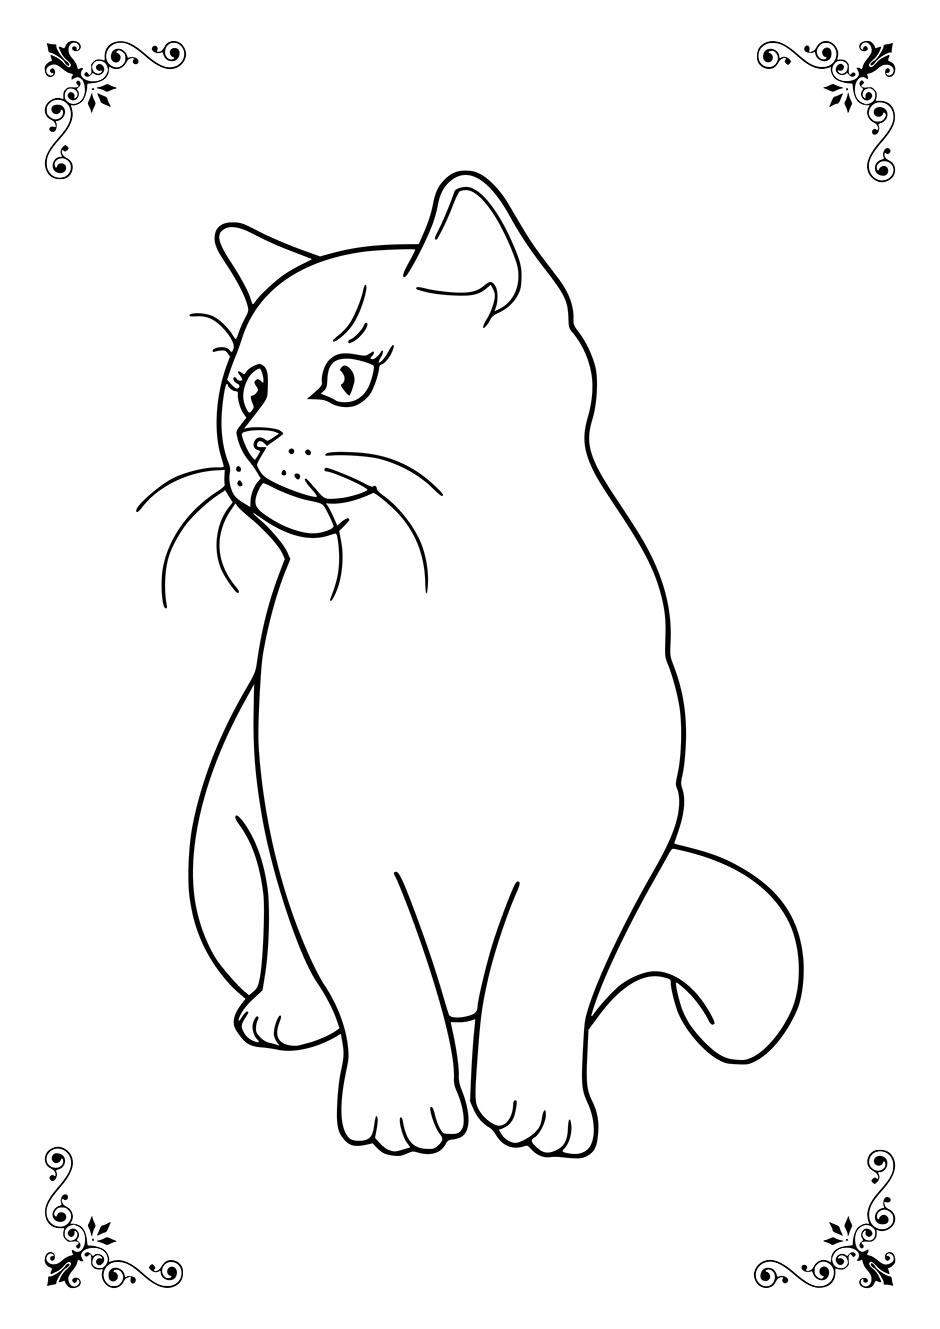 Простая раскраска: кошка — raskraski-a4.ru